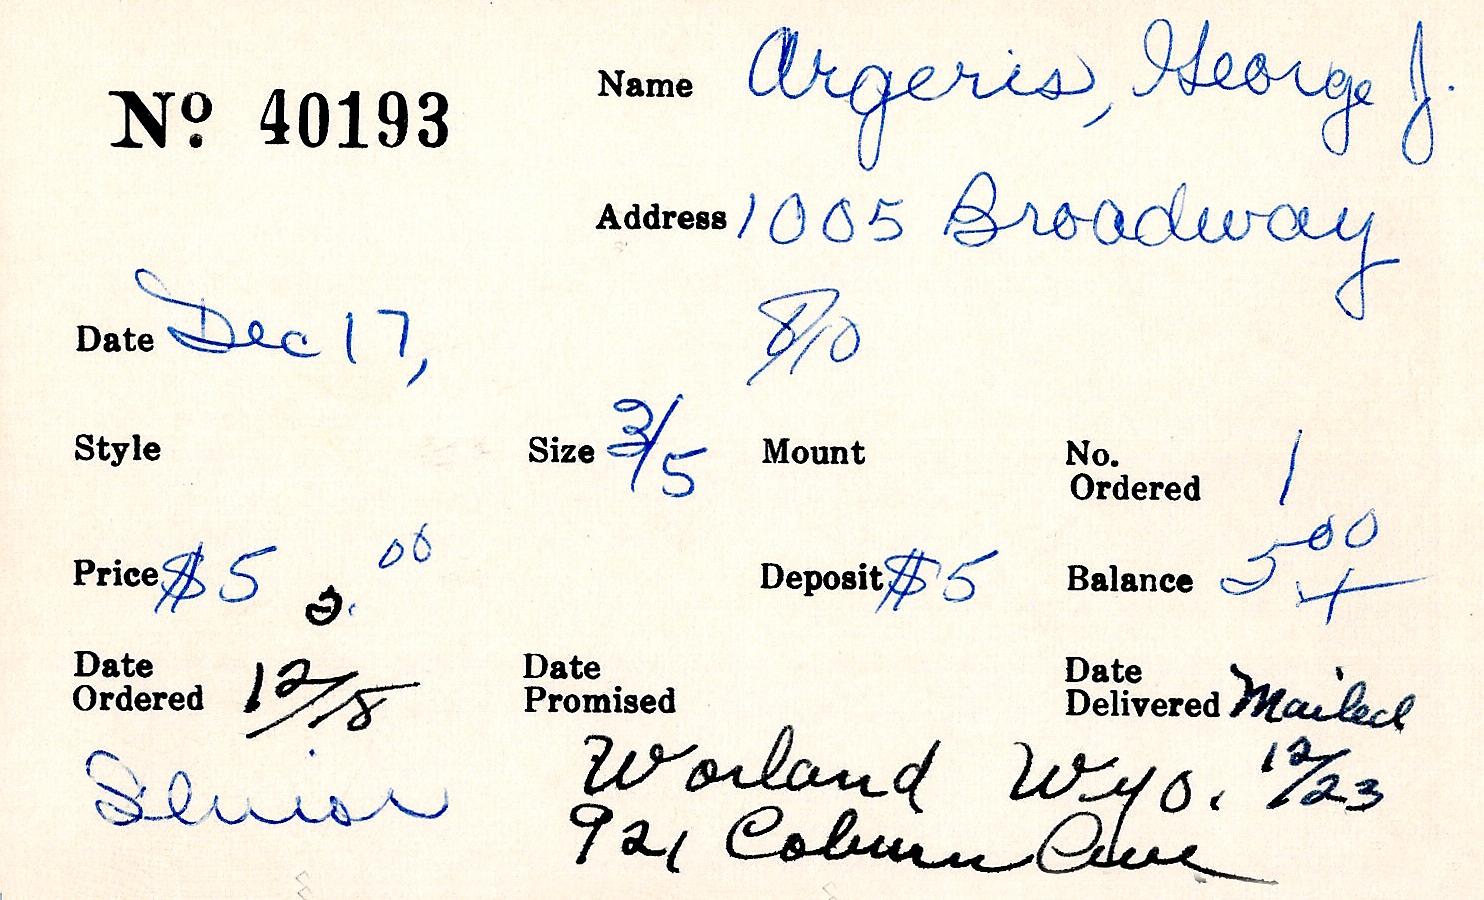 Index card for George J. Argeris